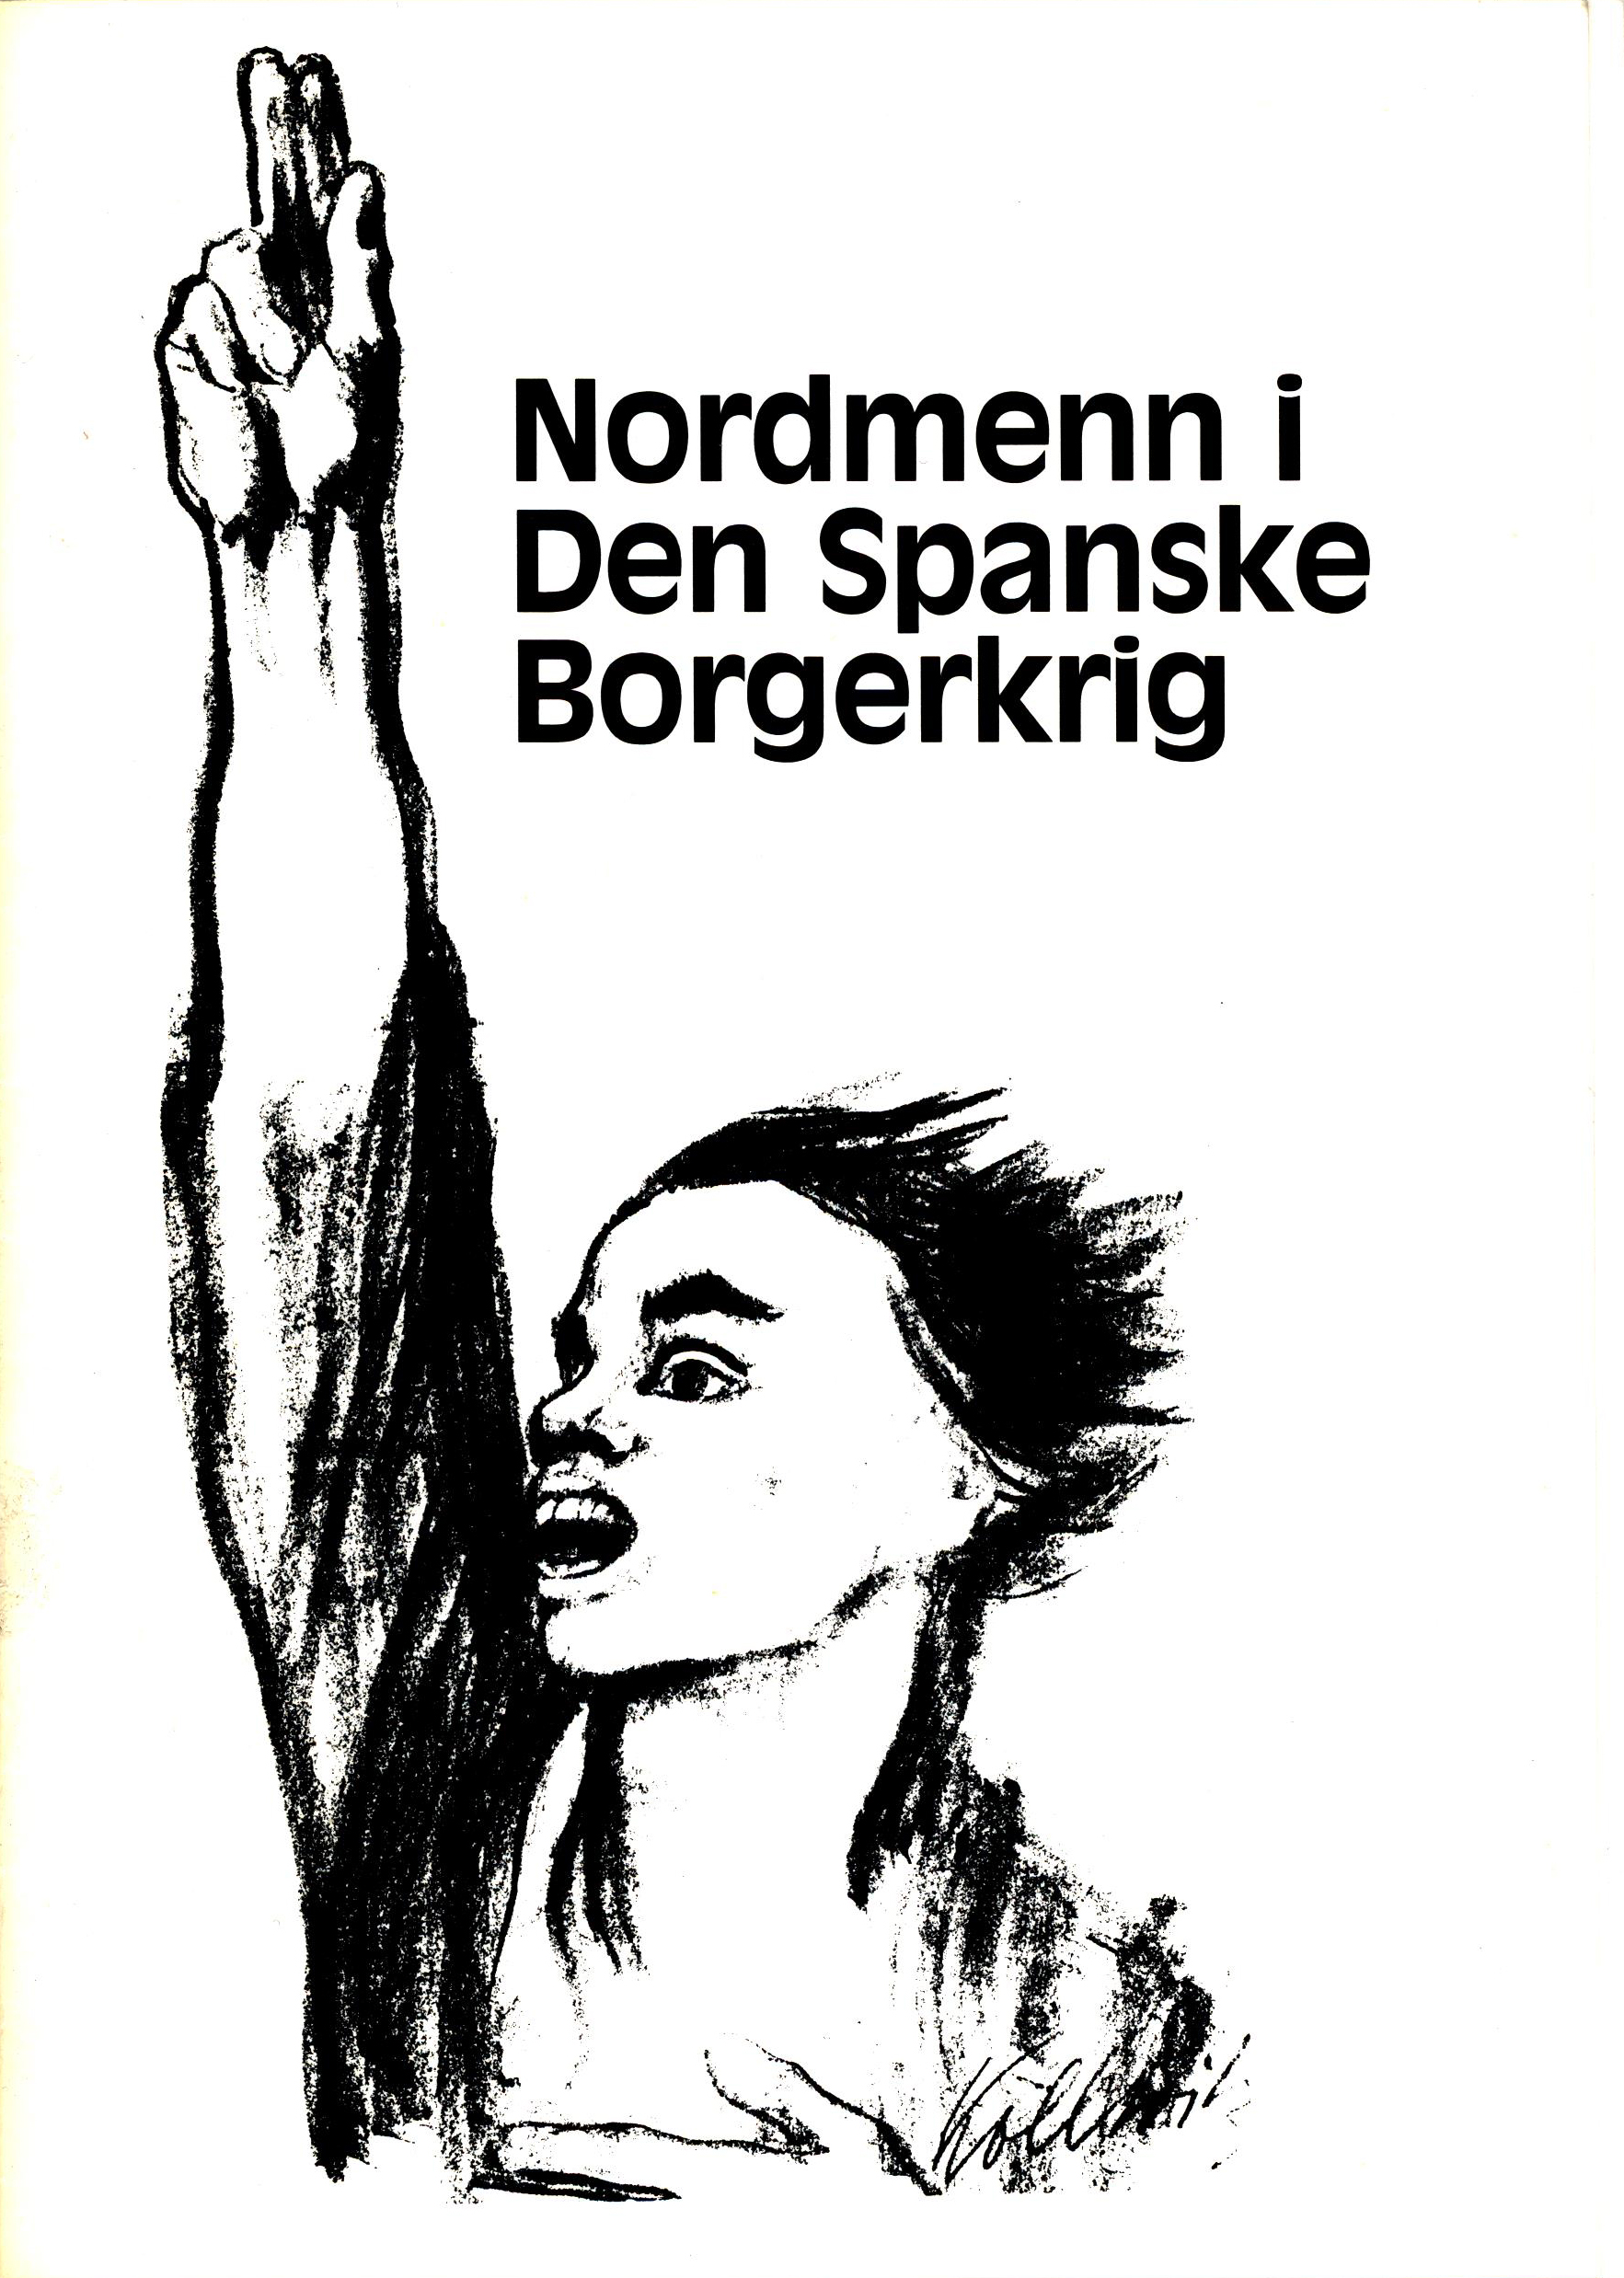 Nordmenn i den spanske borgerkrig